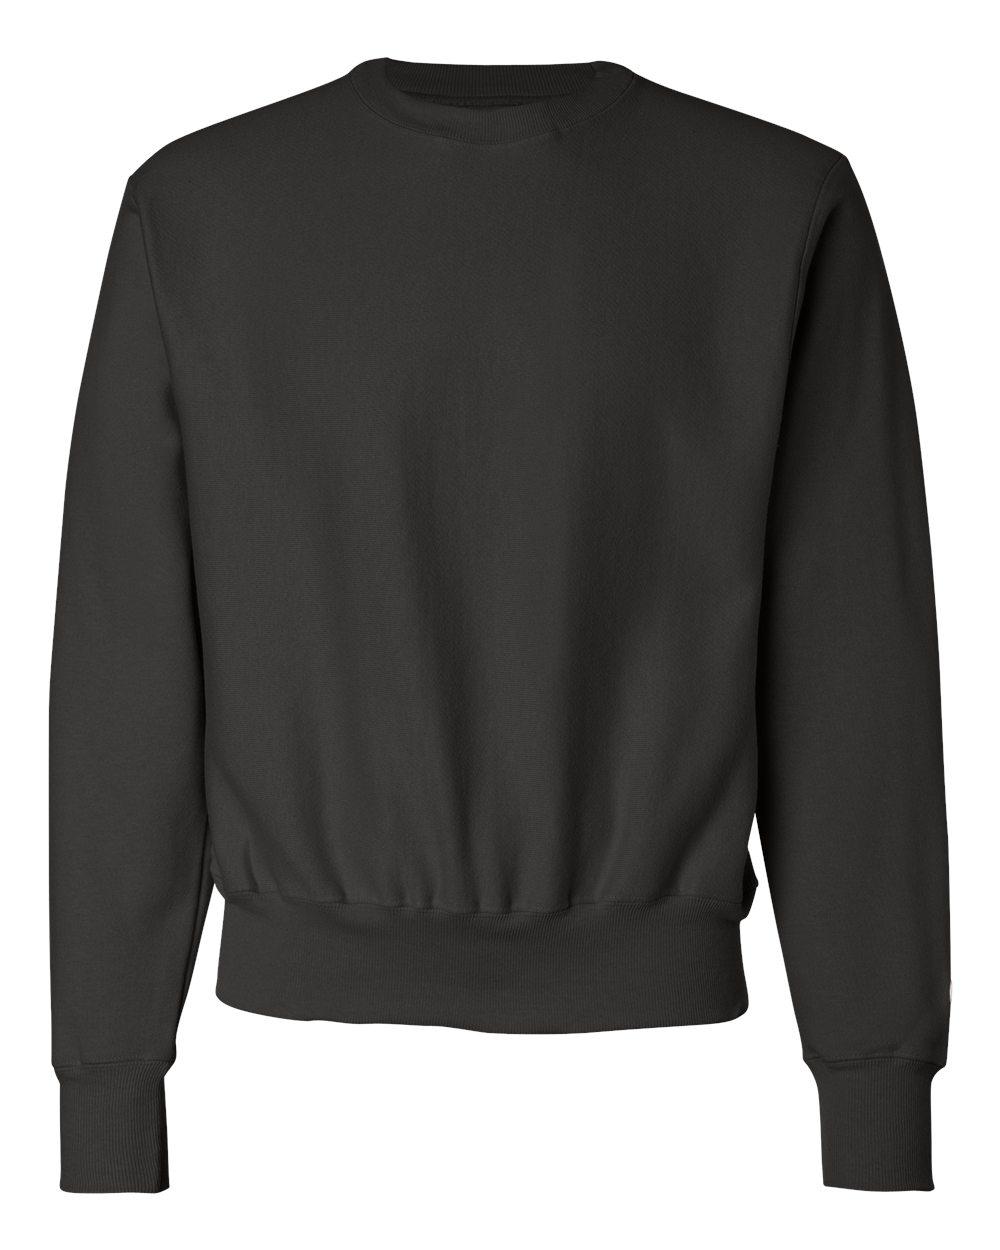 Champion-Mens-Reverse-Weave-Crewneck-Sweatshirt-Blank-Solid-S149-up-to-3XL thumbnail 9